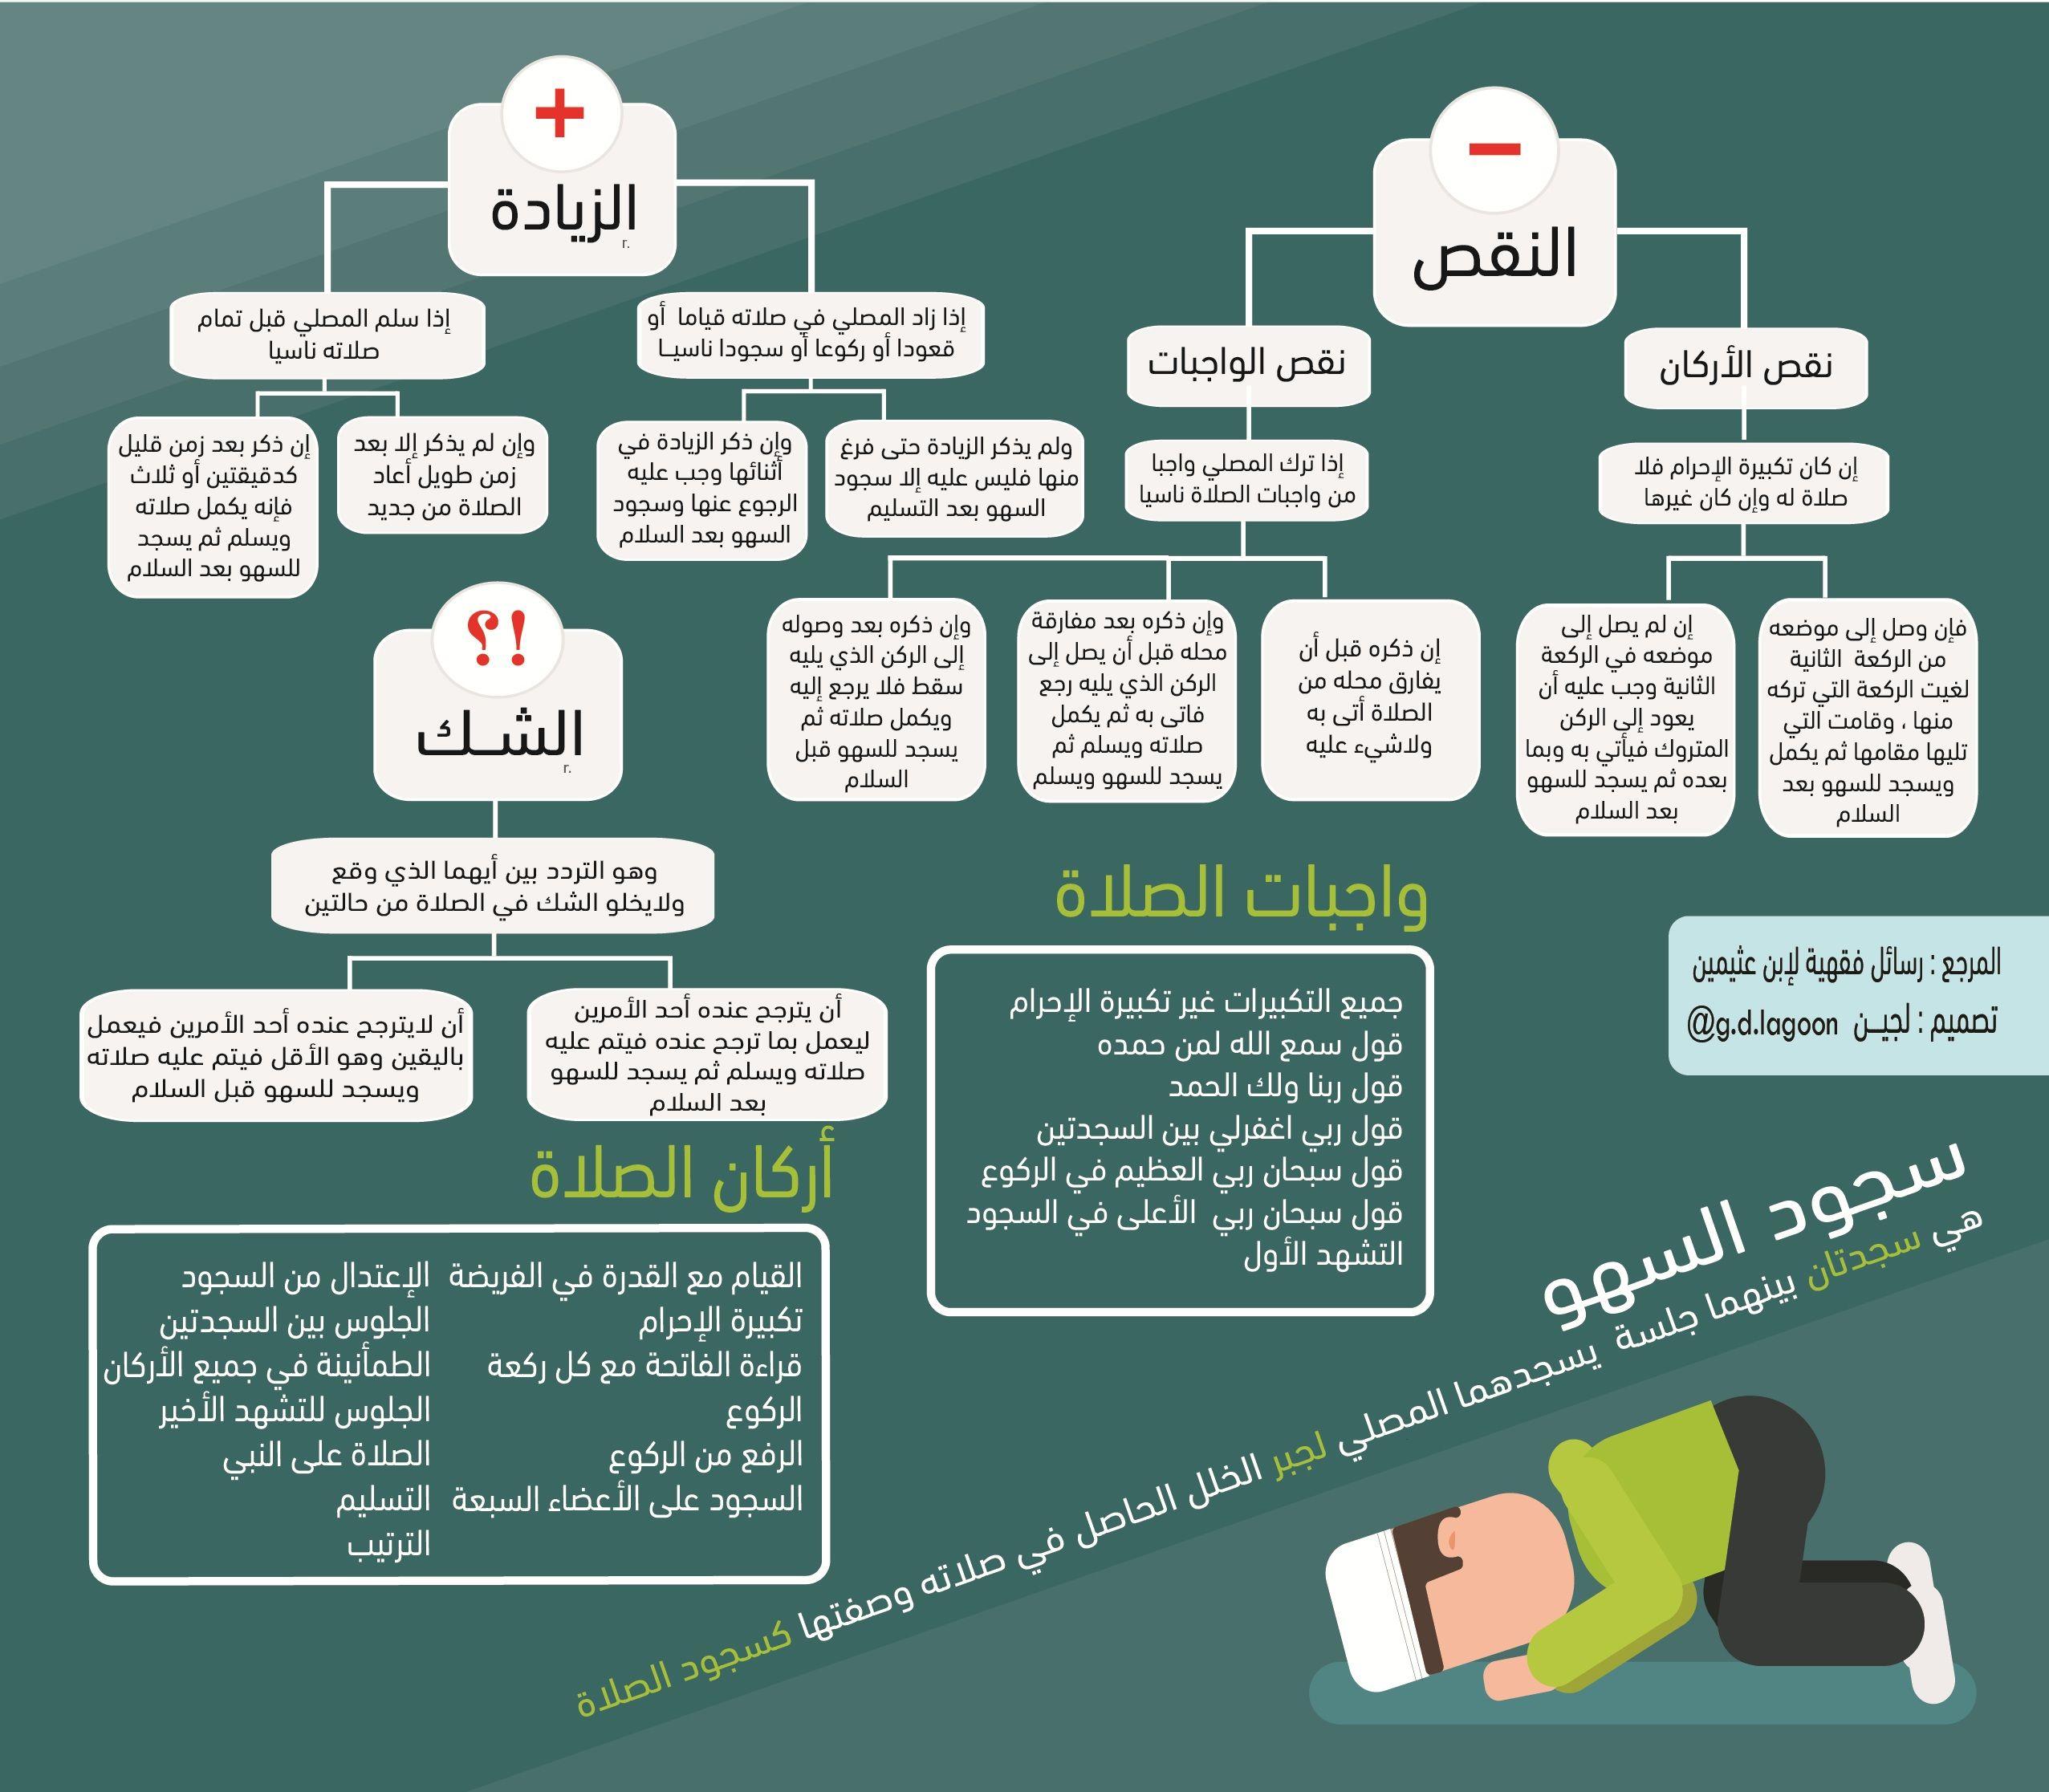 انفوجرافيك سجود السهو Islam Facts Islam Beliefs Beliefs